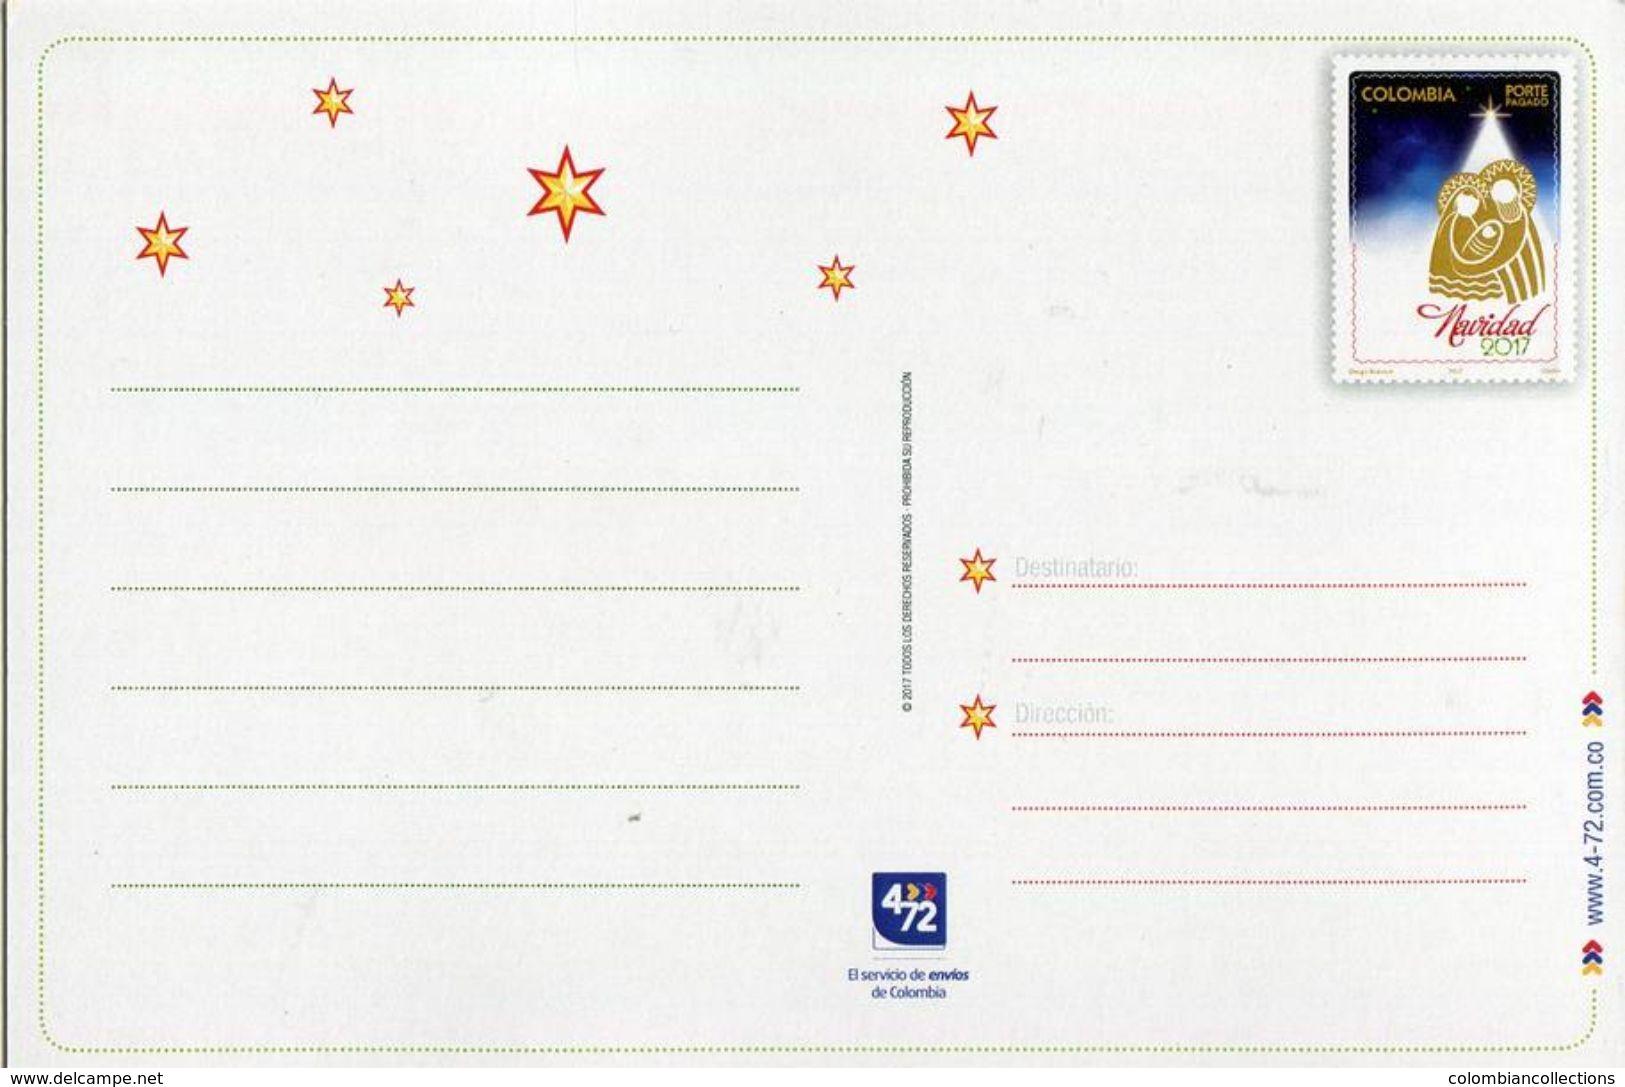 Lote PEP980, Colombia, Entero Postal, Postal Stationary, Postcard, 4-72, 2017, Navidad, Christmas - Colombia